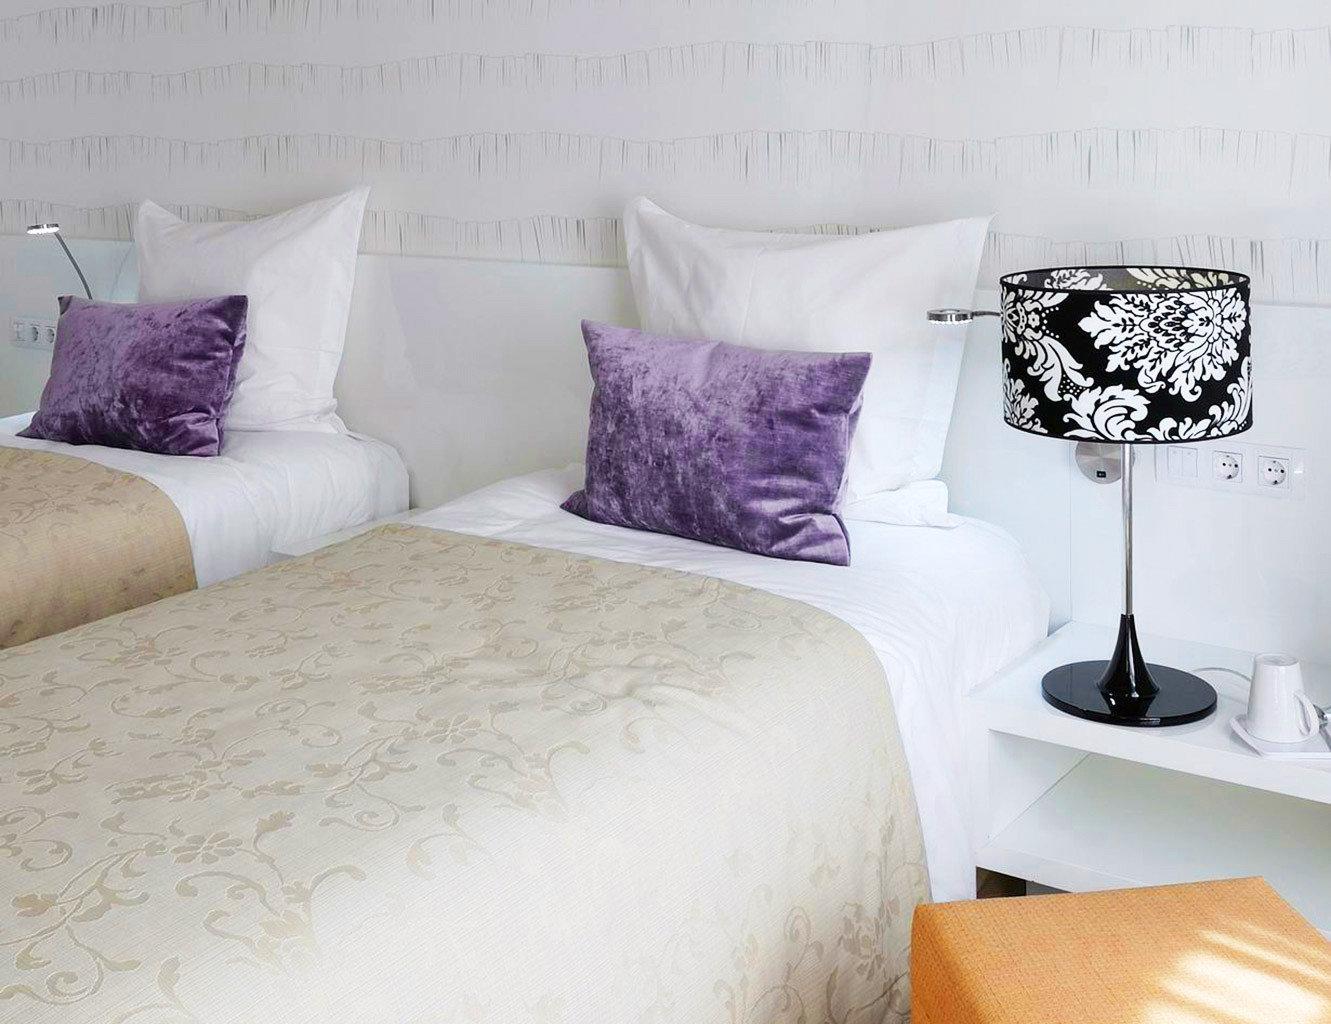 Bedroom Modern sofa pillow duvet cover bed sheet textile material lamp night colored tan